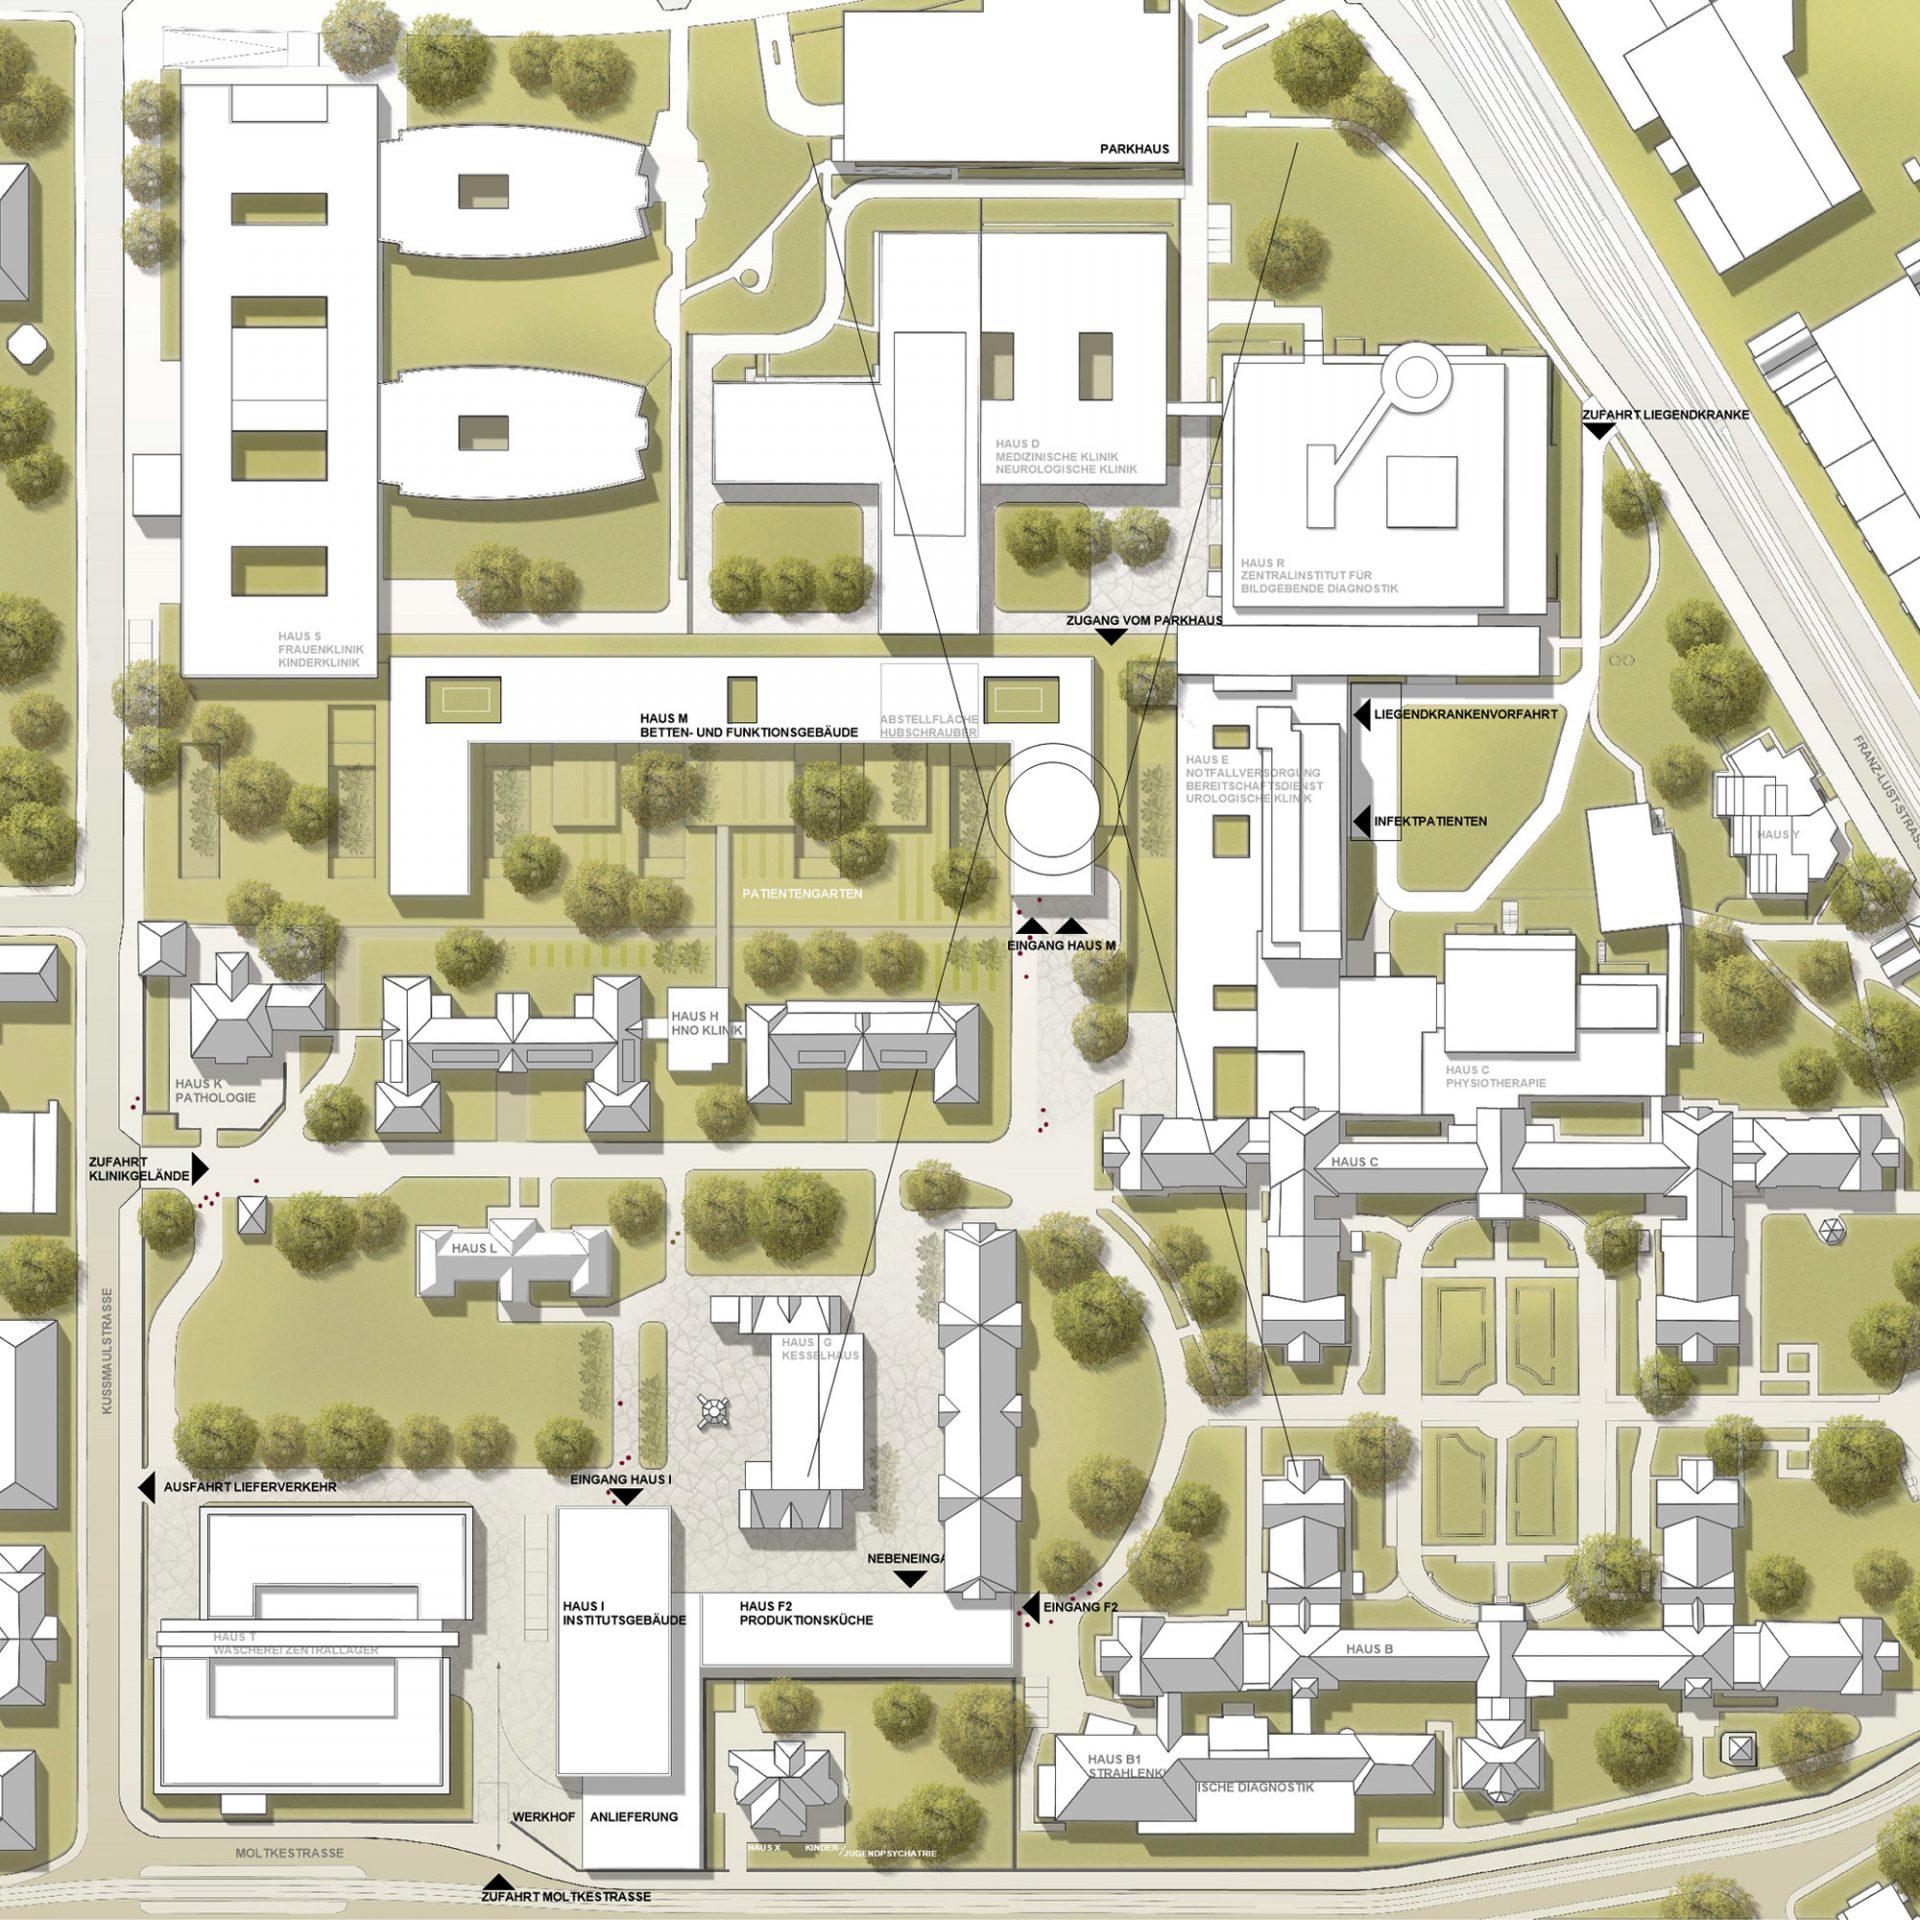 Klinikum Karlsruhe – Zielplanung 2015